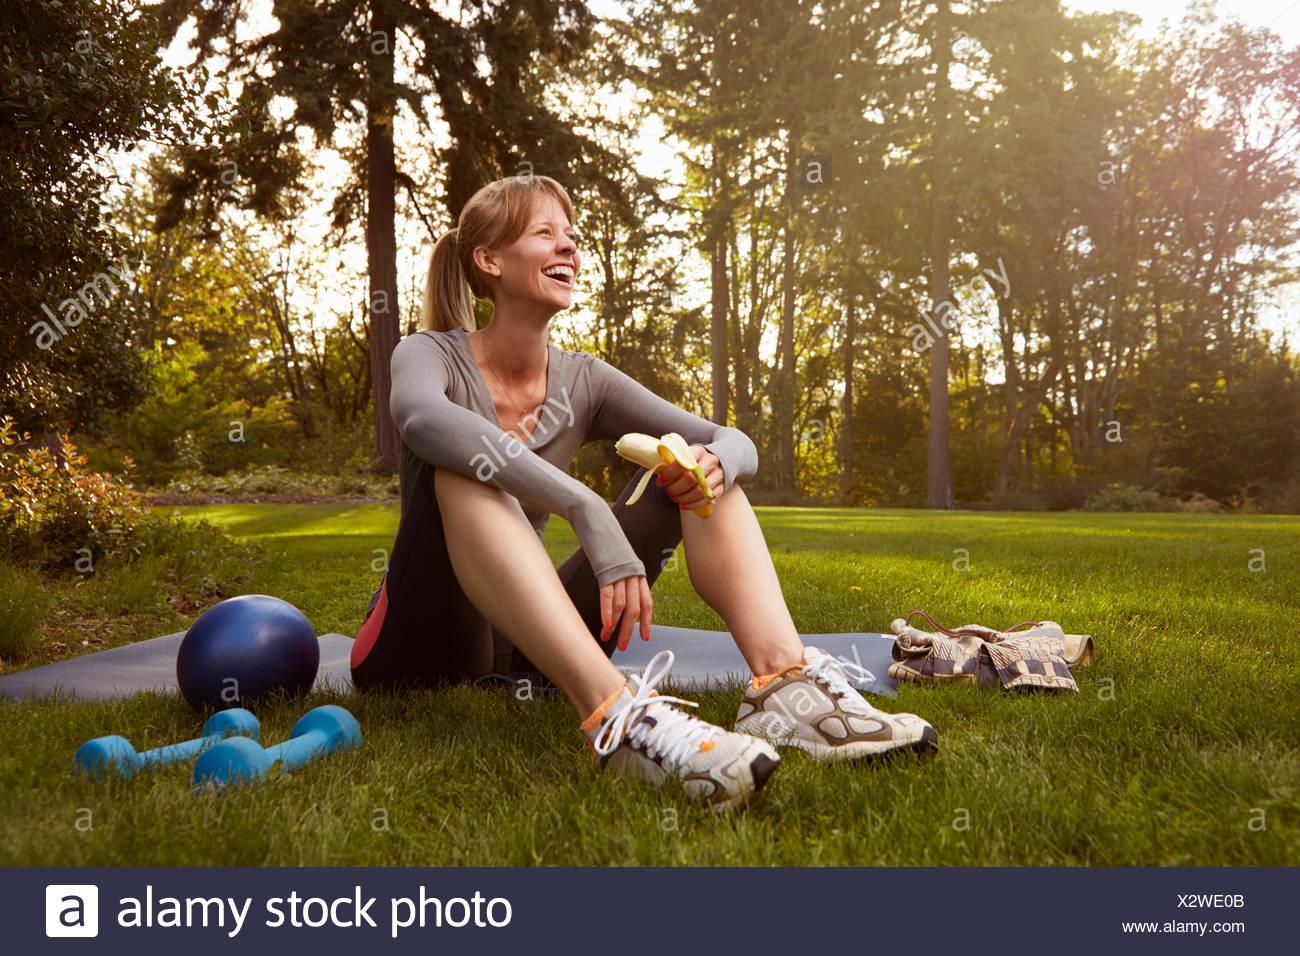 Mitte Erwachsene Frau im Park Pause Übung Stockbild